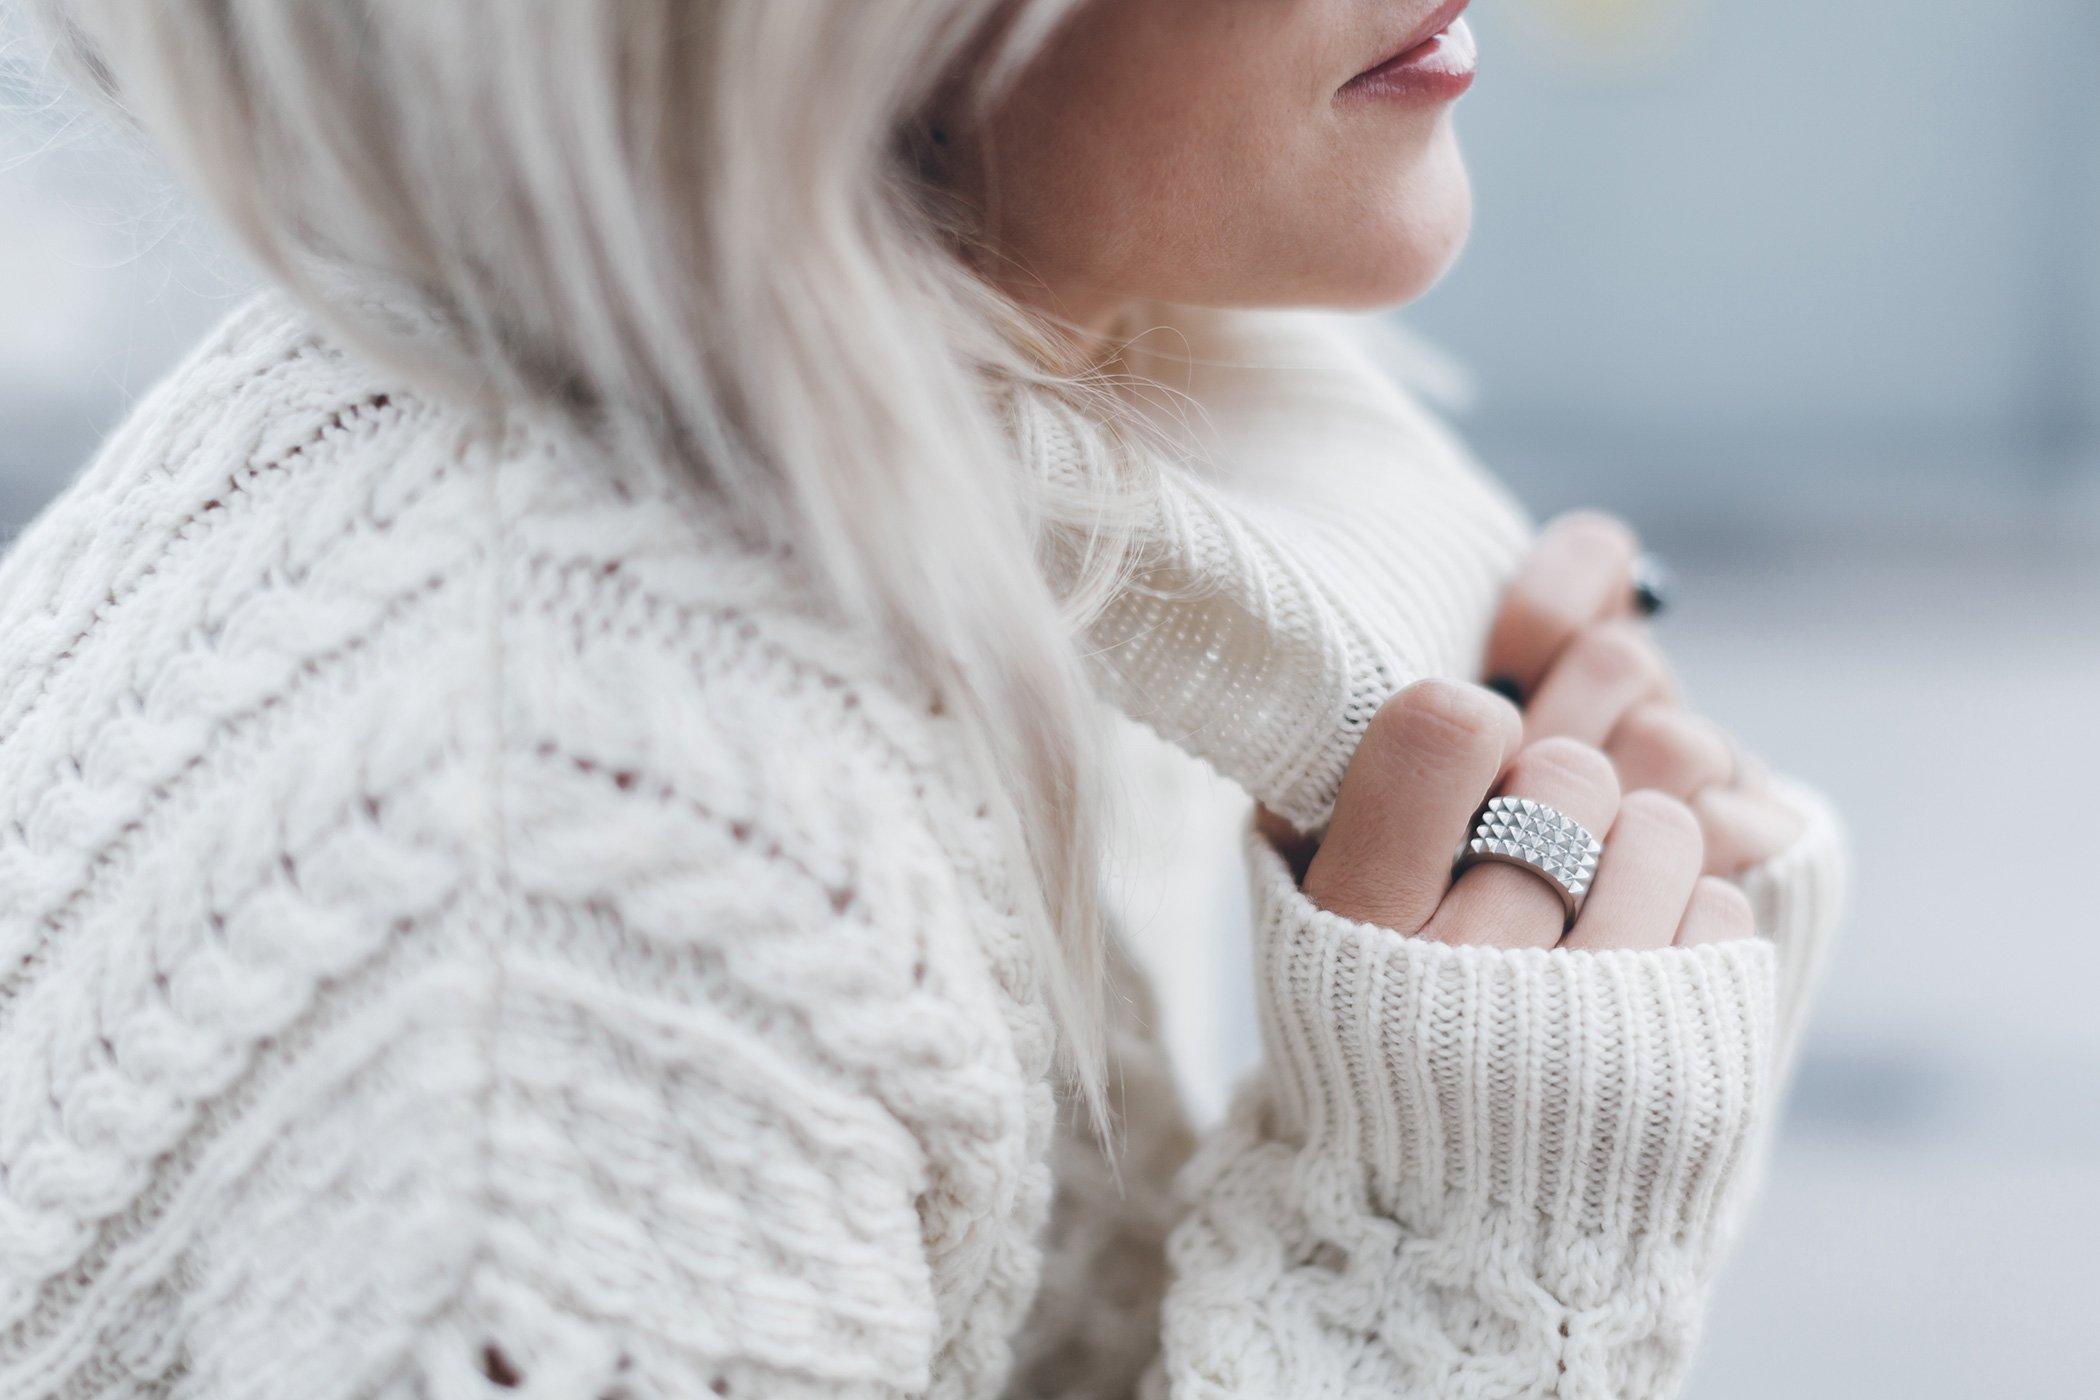 mikuta-with-a-wool-sweater-7